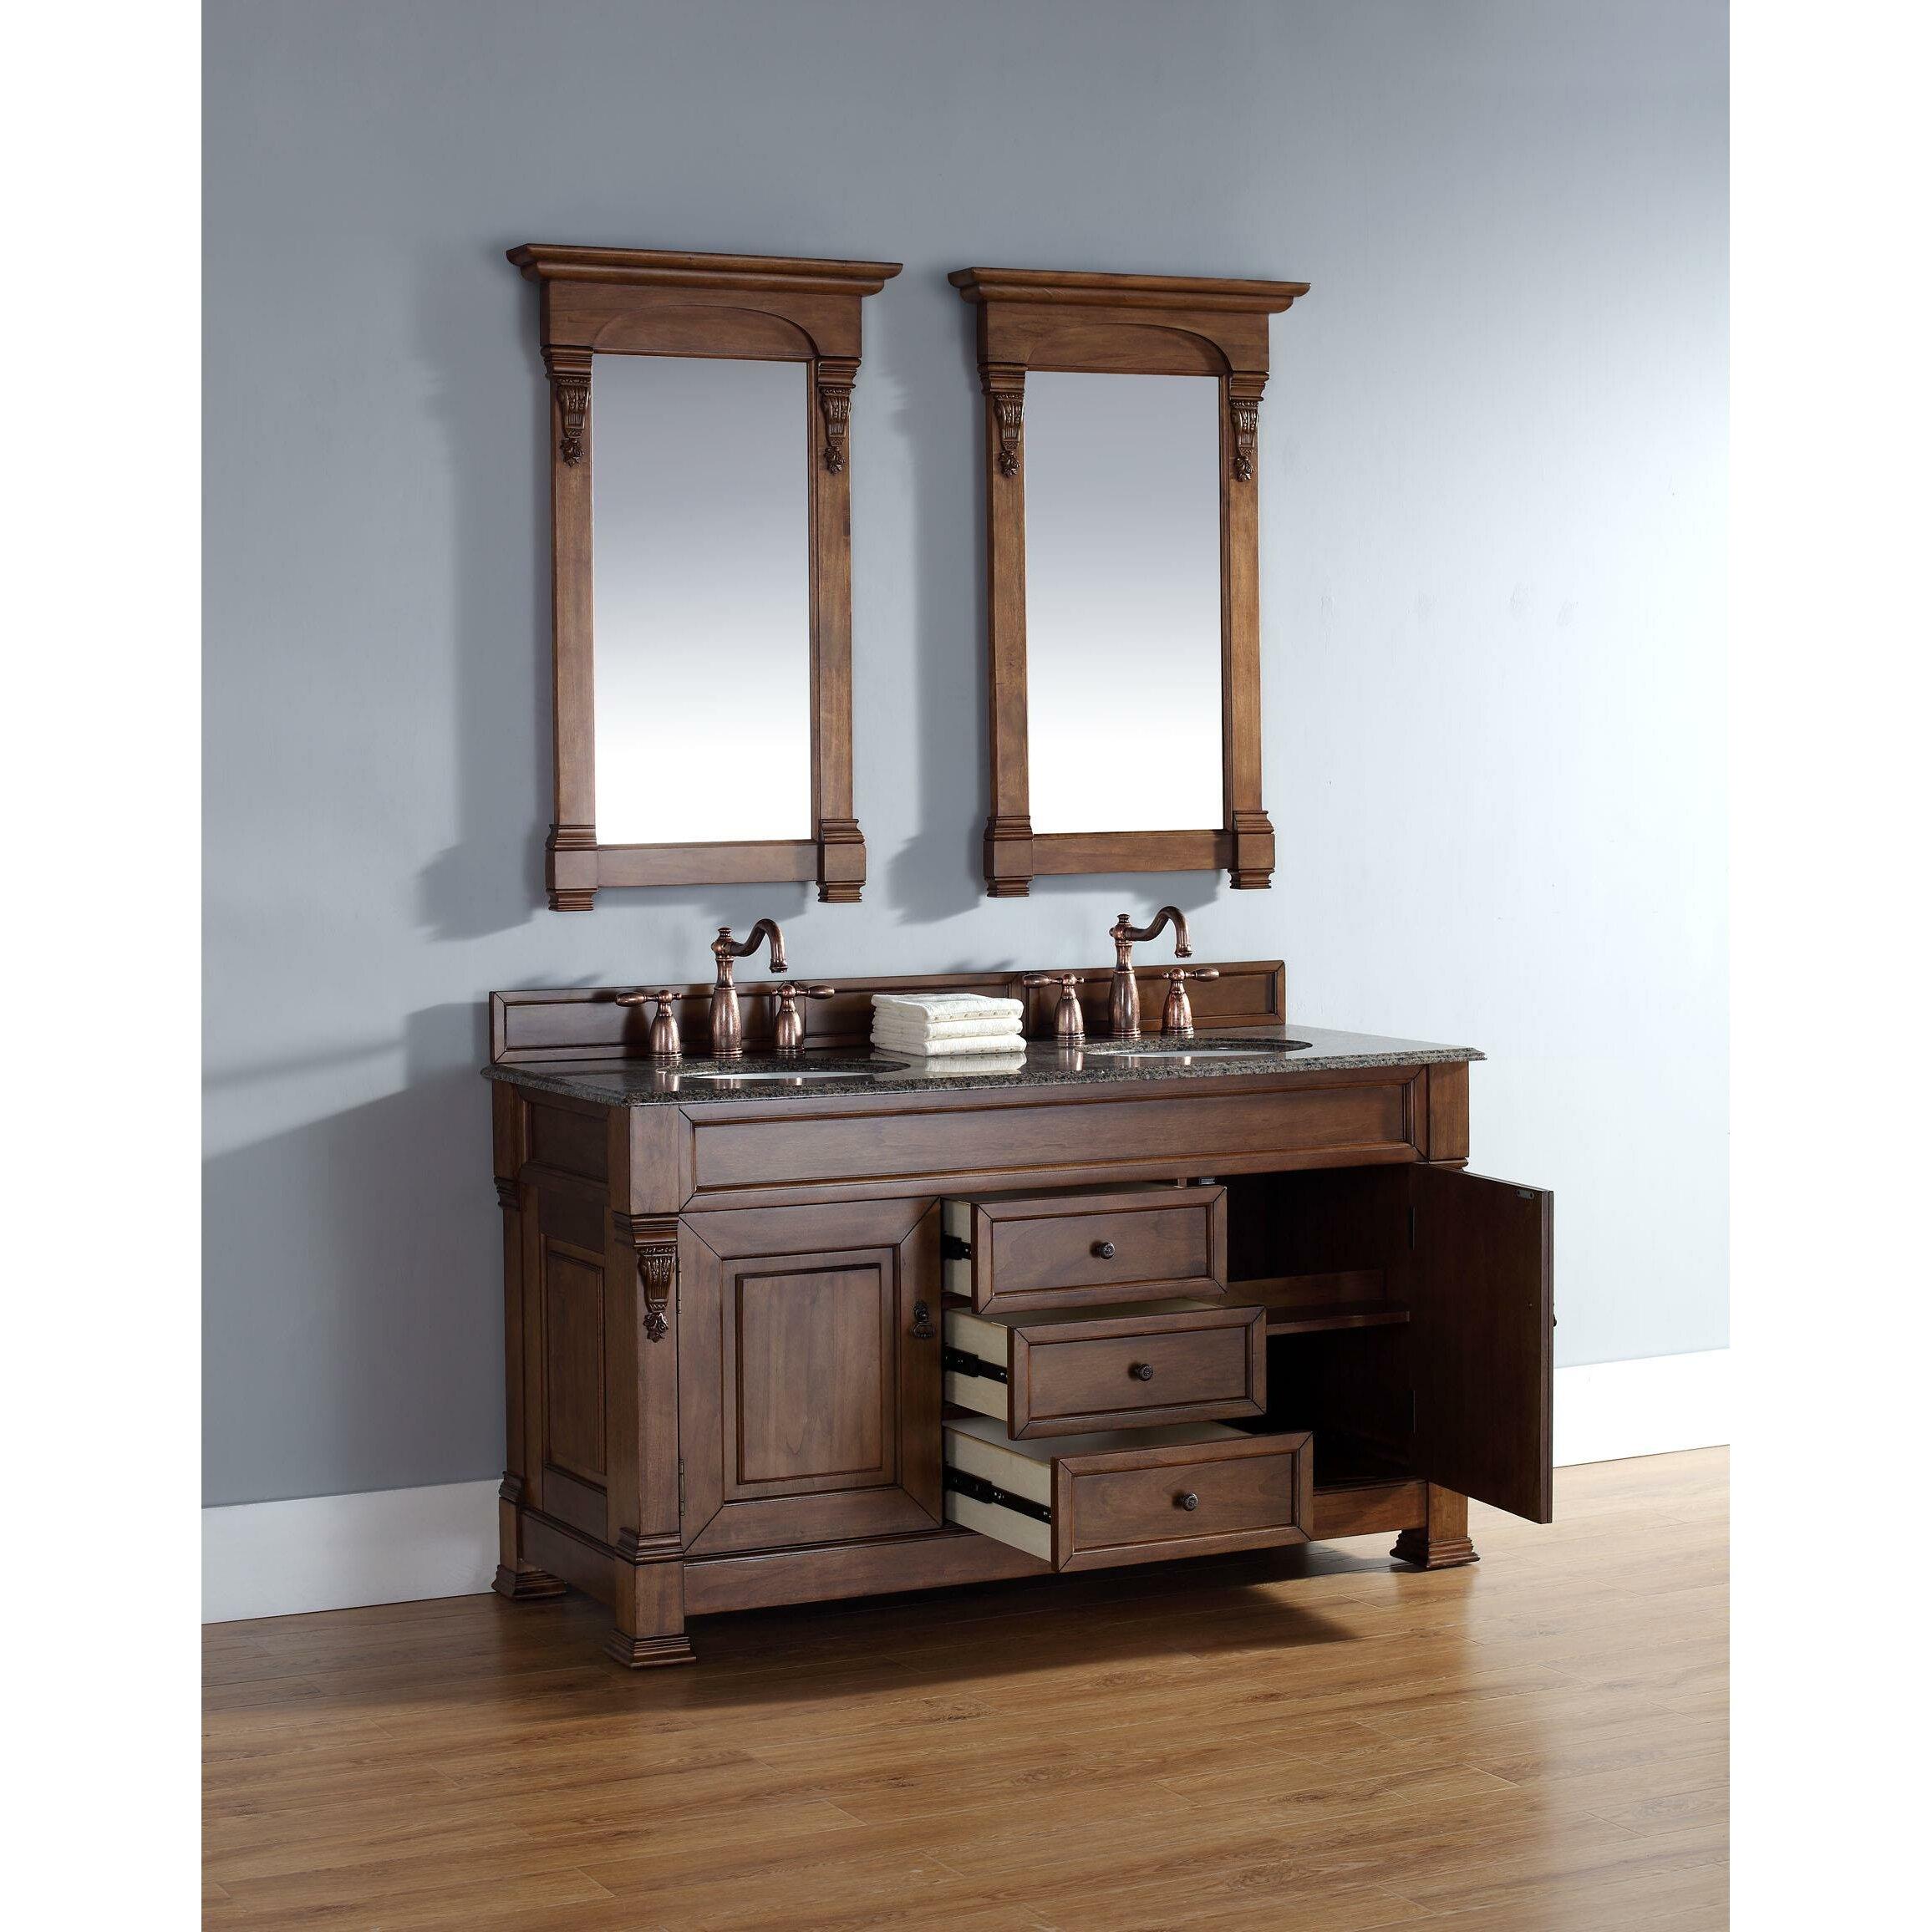 Bathroom Vanity Base James Martin Furniture Brookfield 60 Double Bathroom Vanity Base